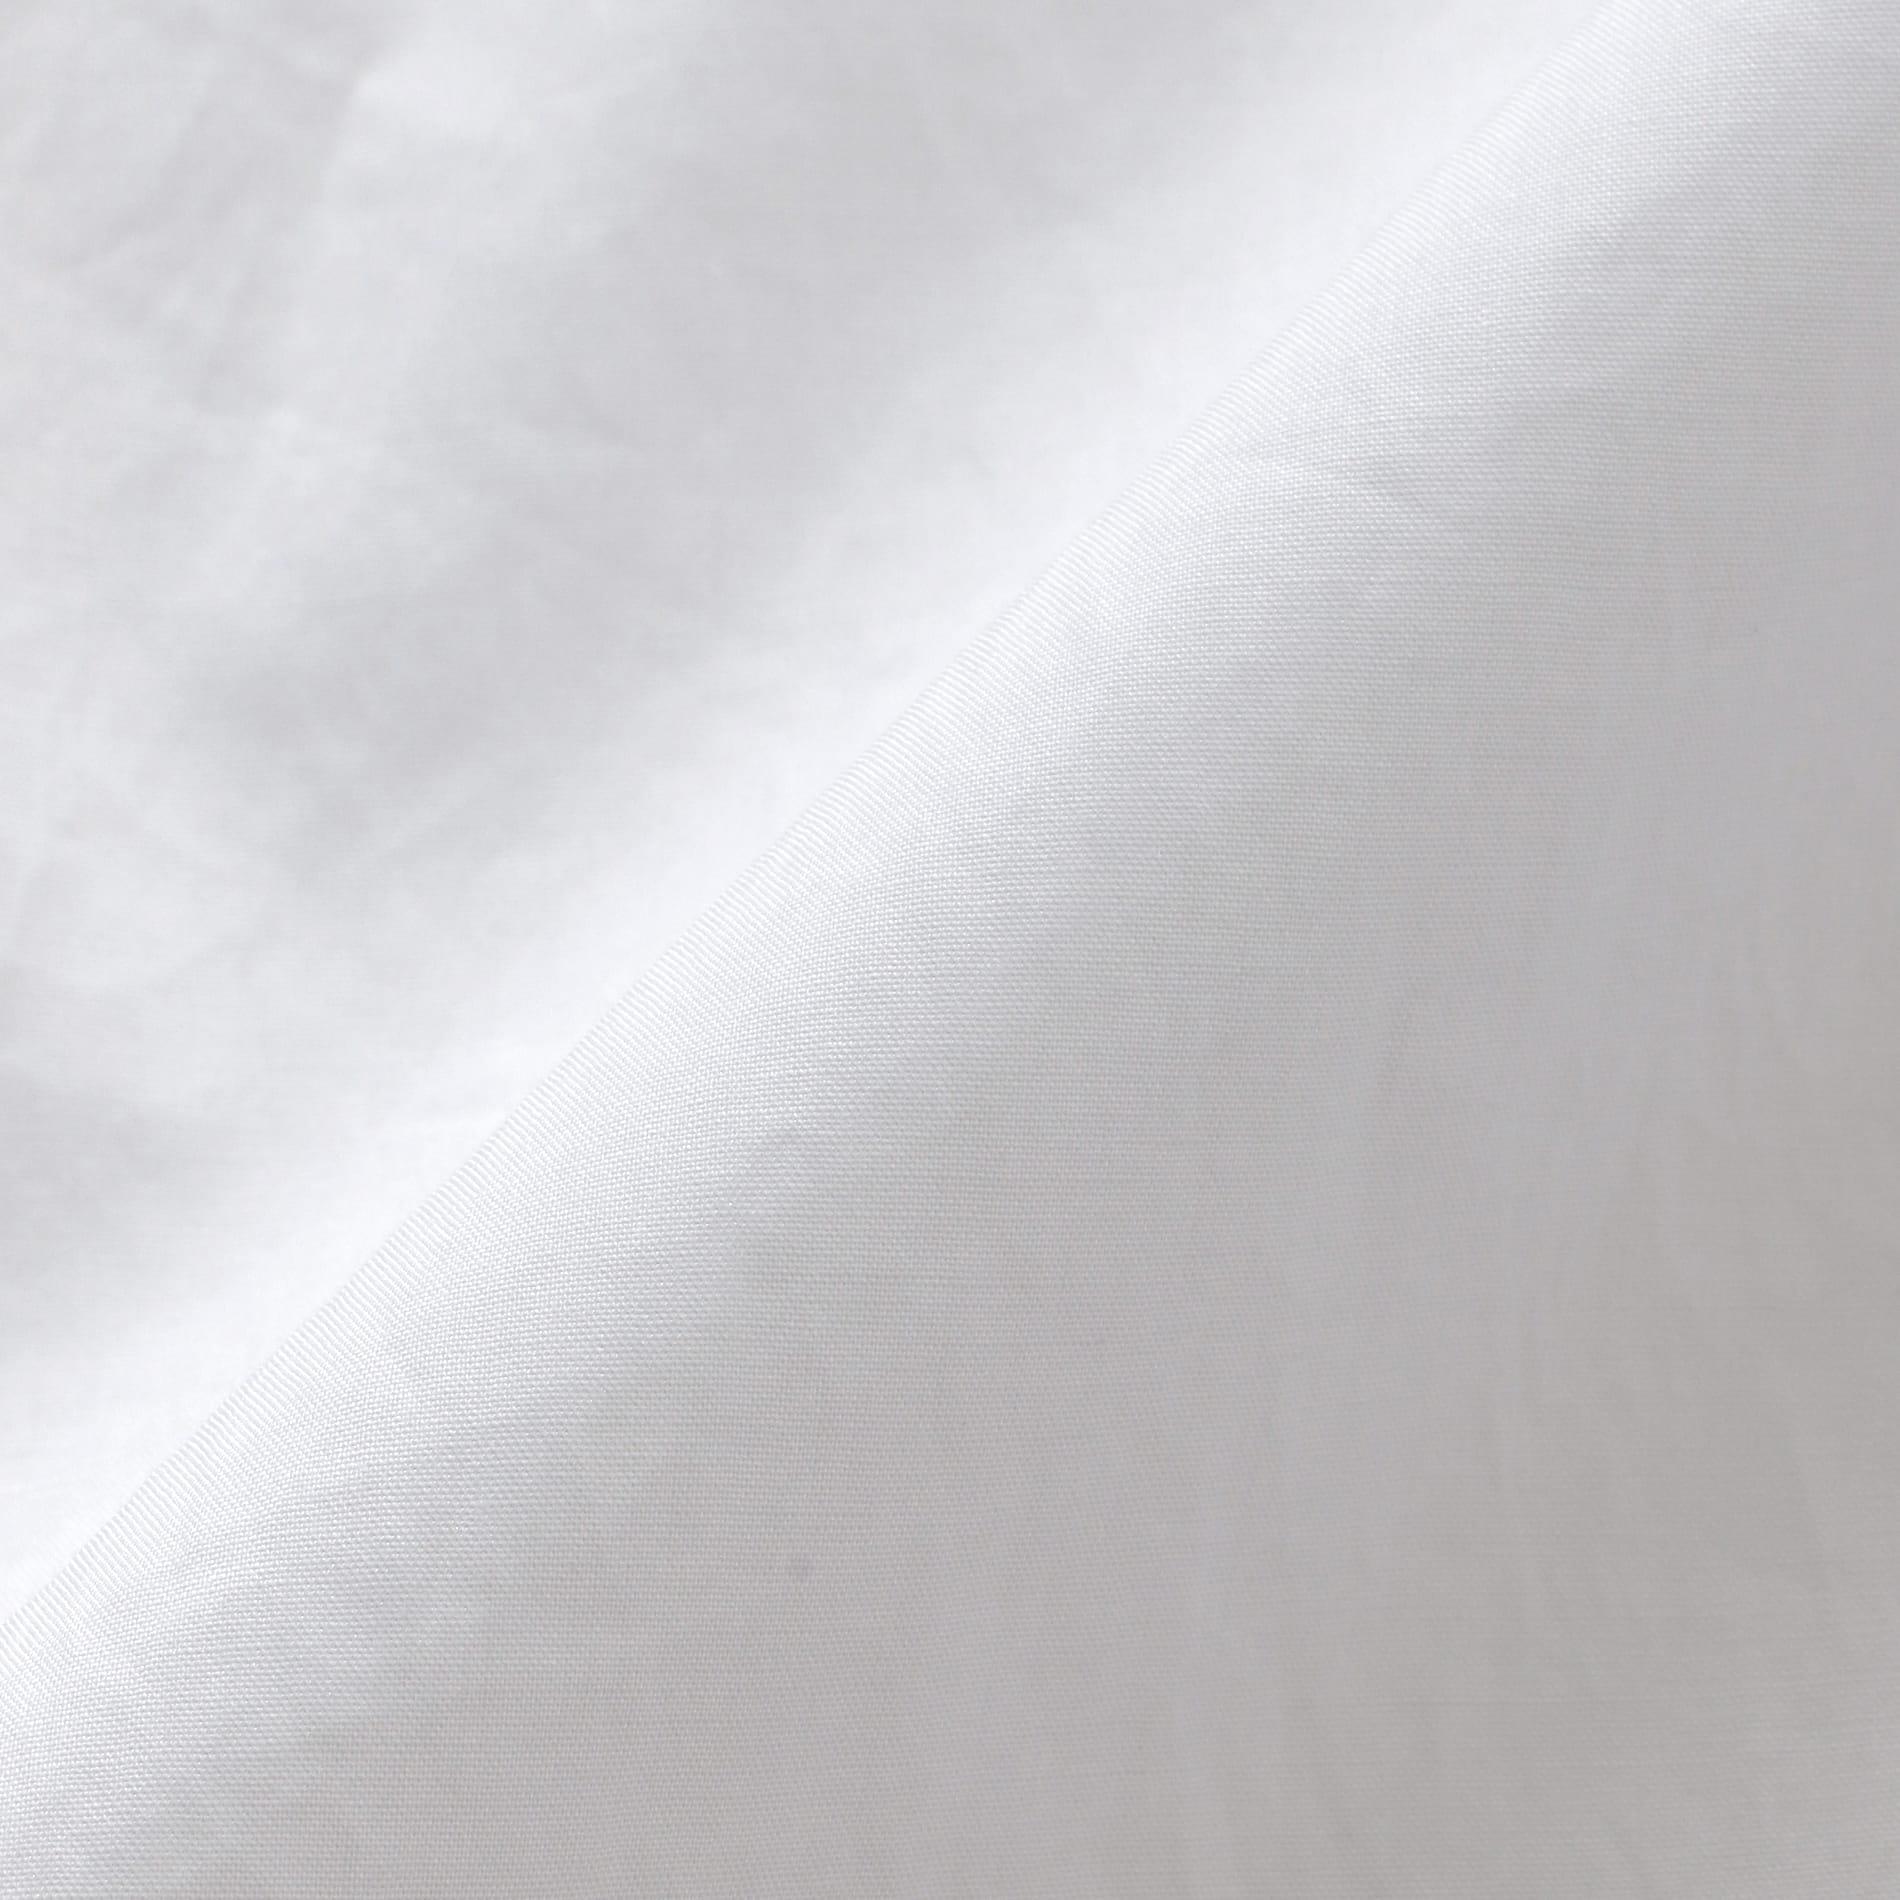 【MELITTA BAUMEISTER】WOMEN BIG SLEEVE SHIRT MB-05-FW20